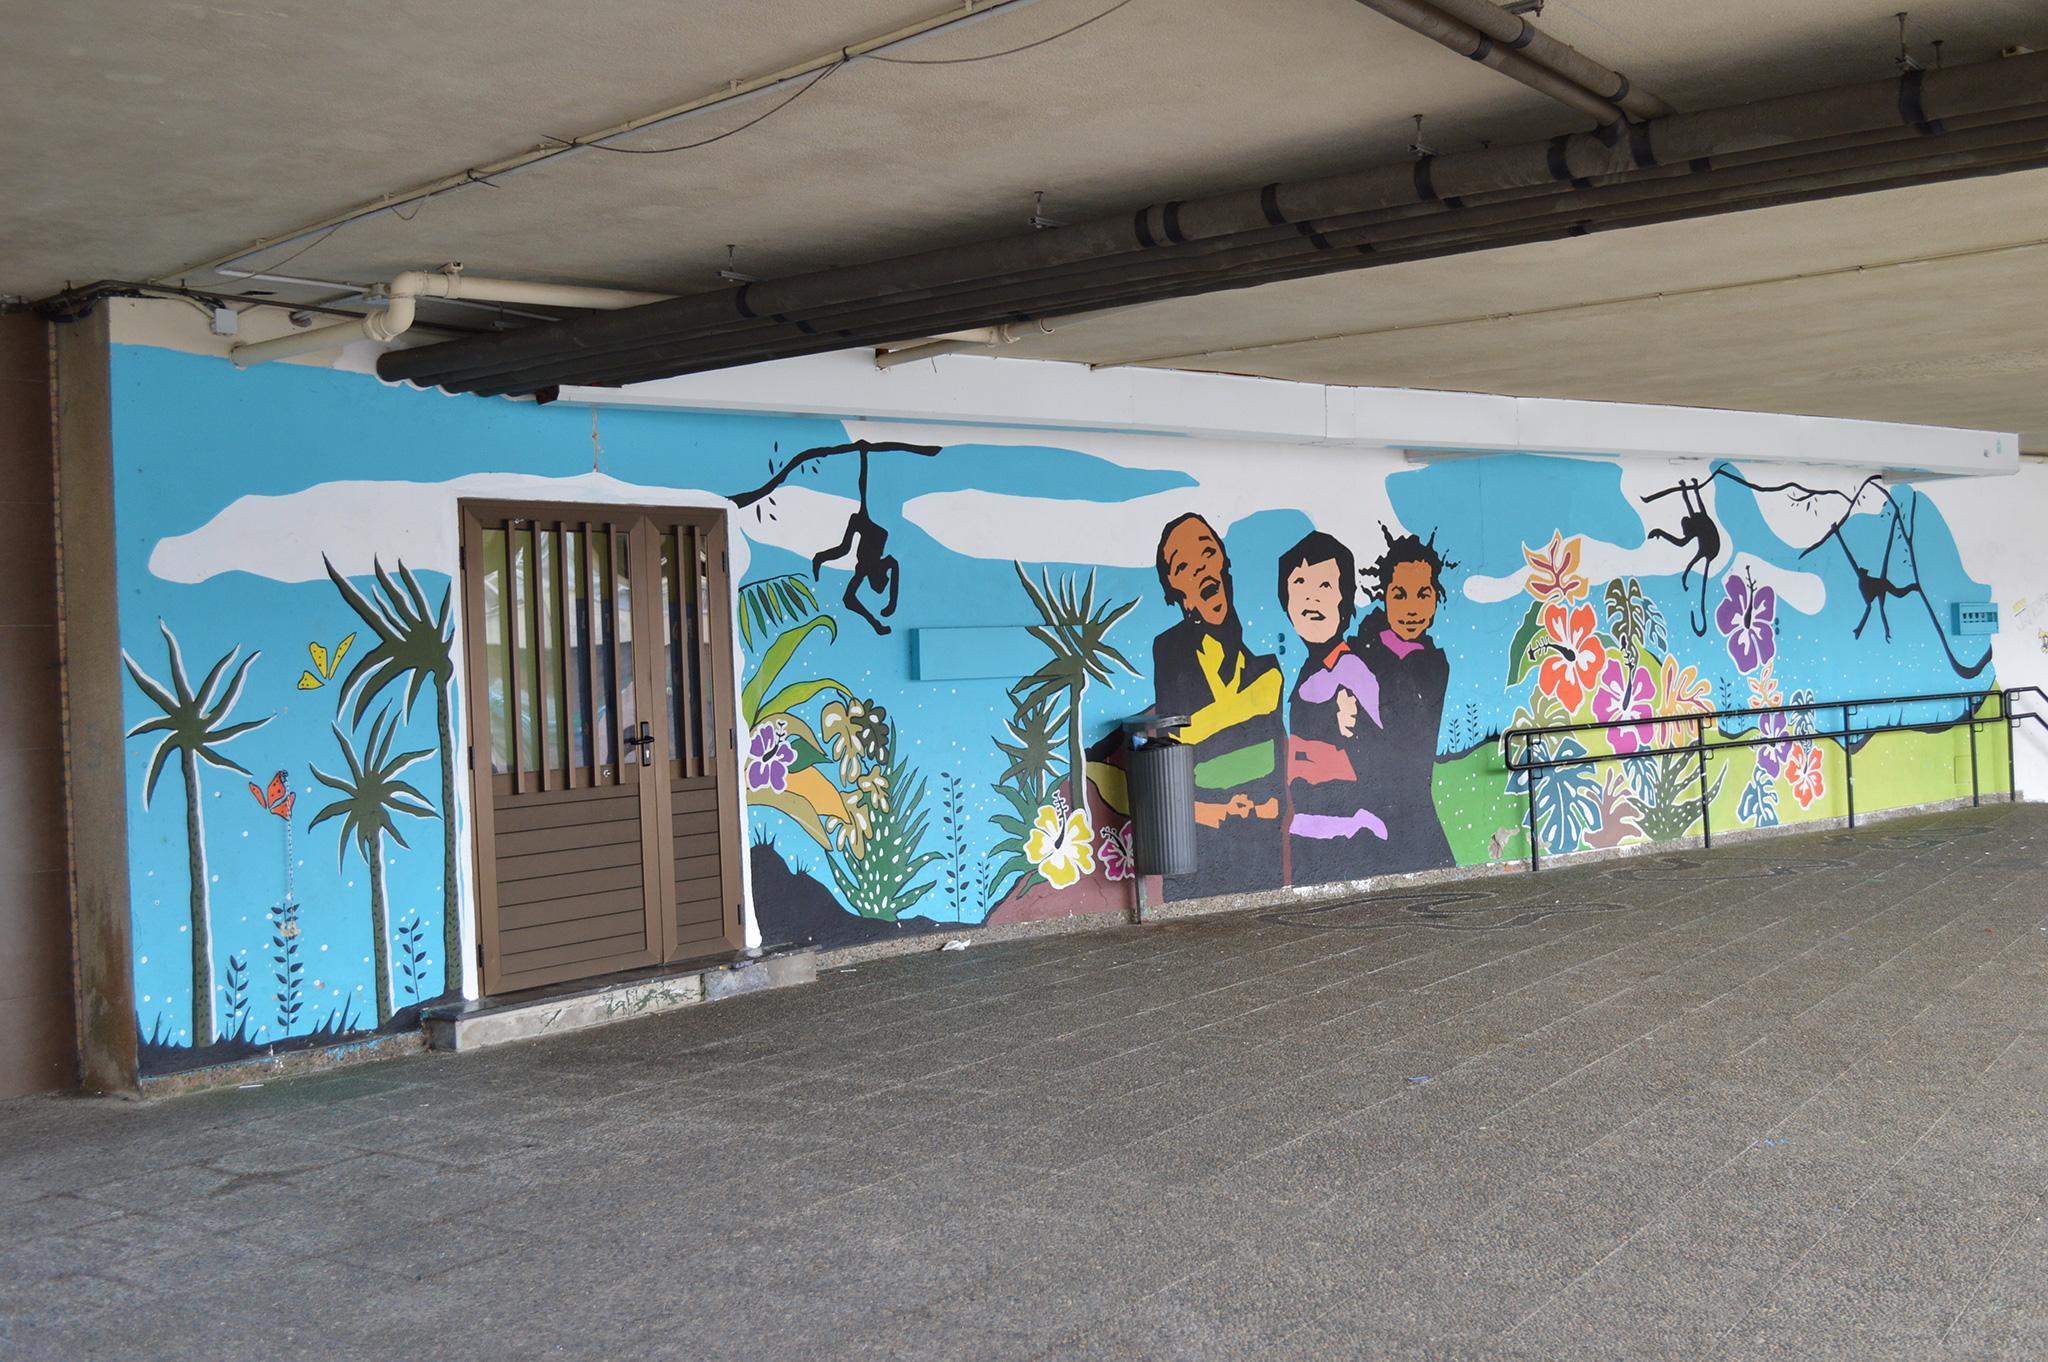 Foto principal mural Tempo de Lecer